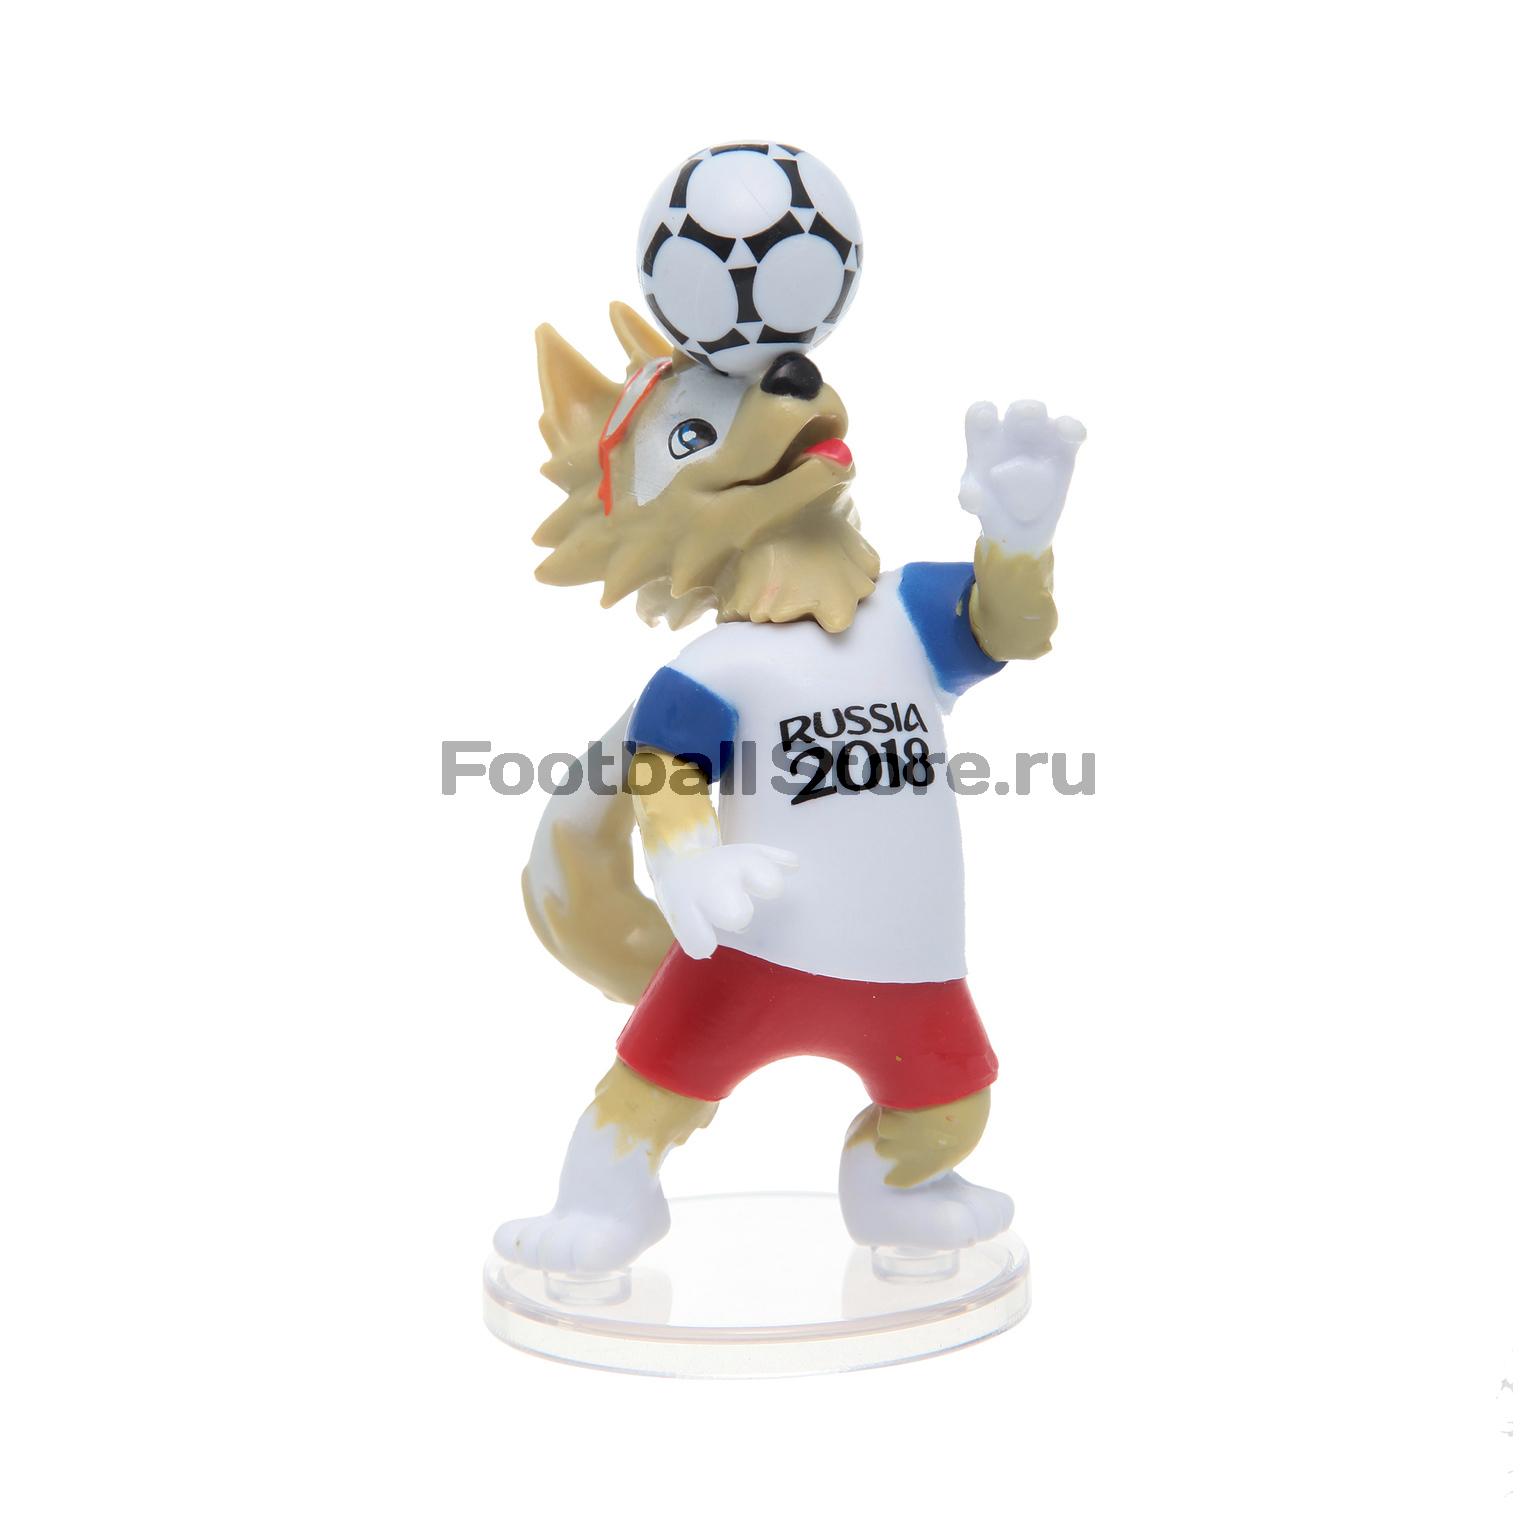 Фигурка Волк Забивака FIFA-2018 УТ-0301 фанатская атрибутика nike curry nba